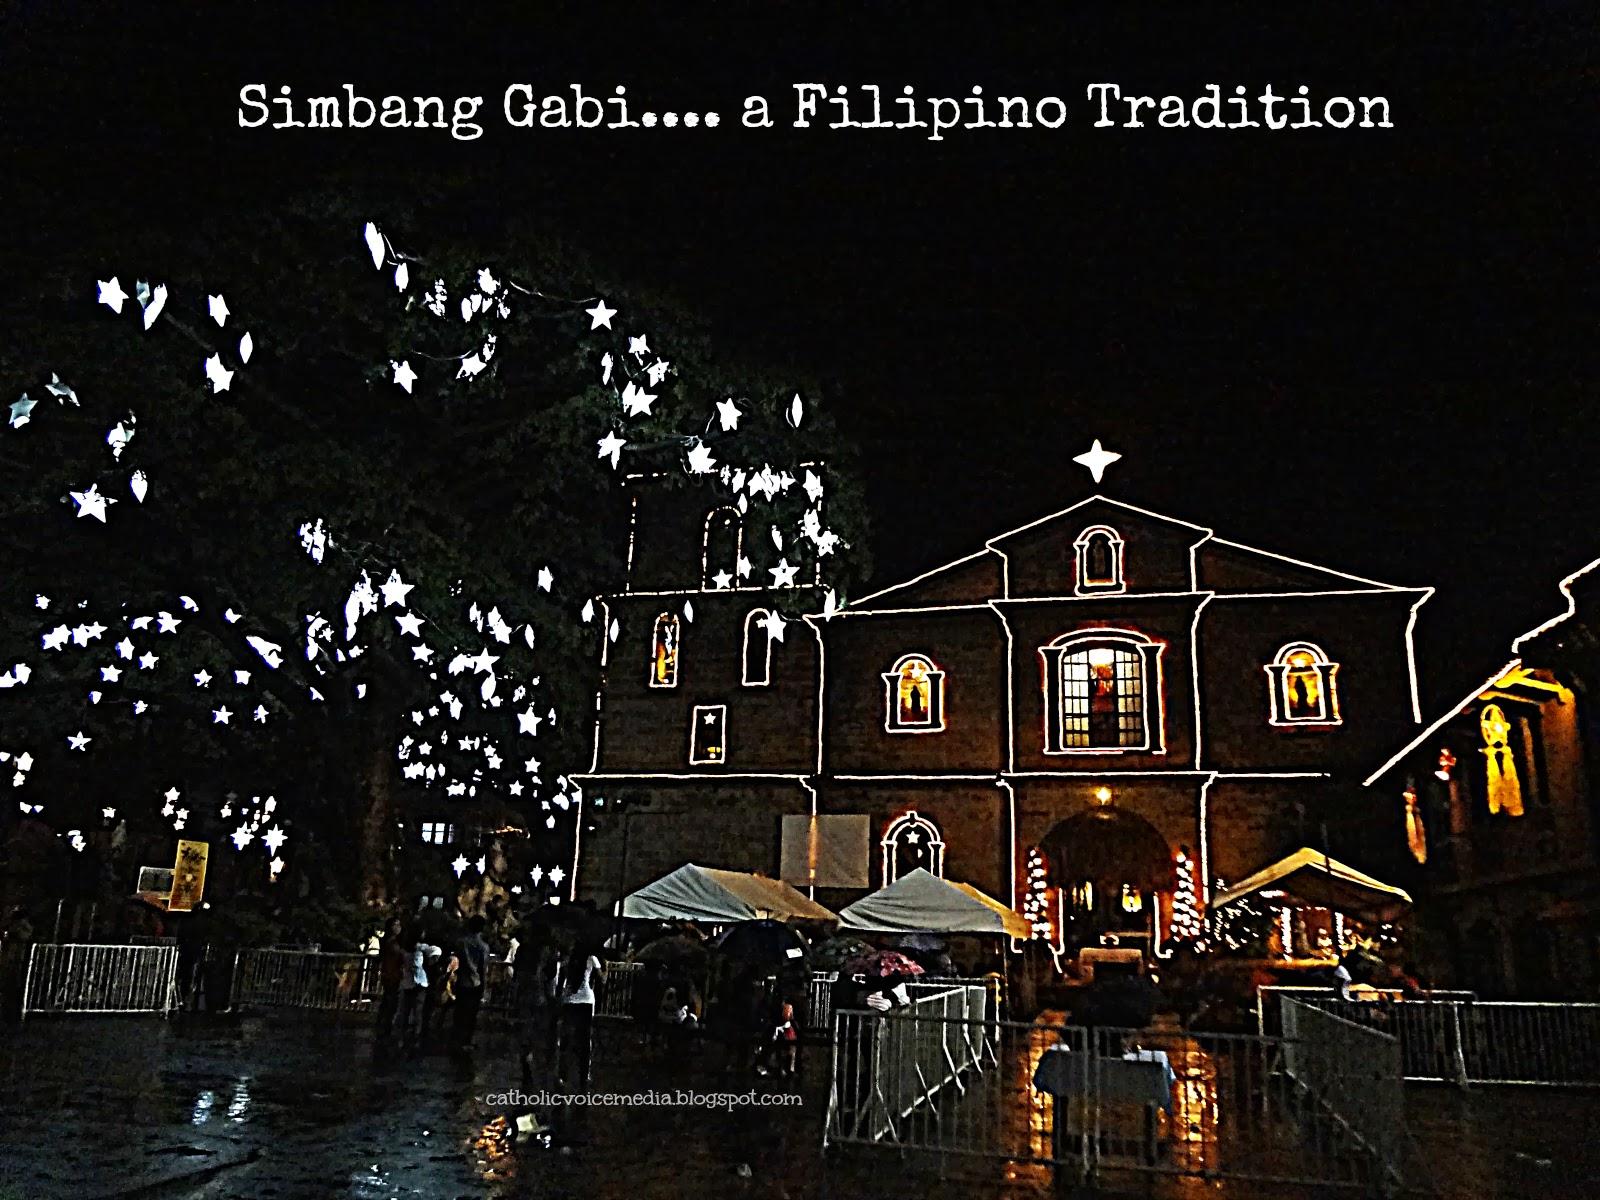 Catholic Voice Media Simbang Gabi Las Pinas Bamboo Organ Church